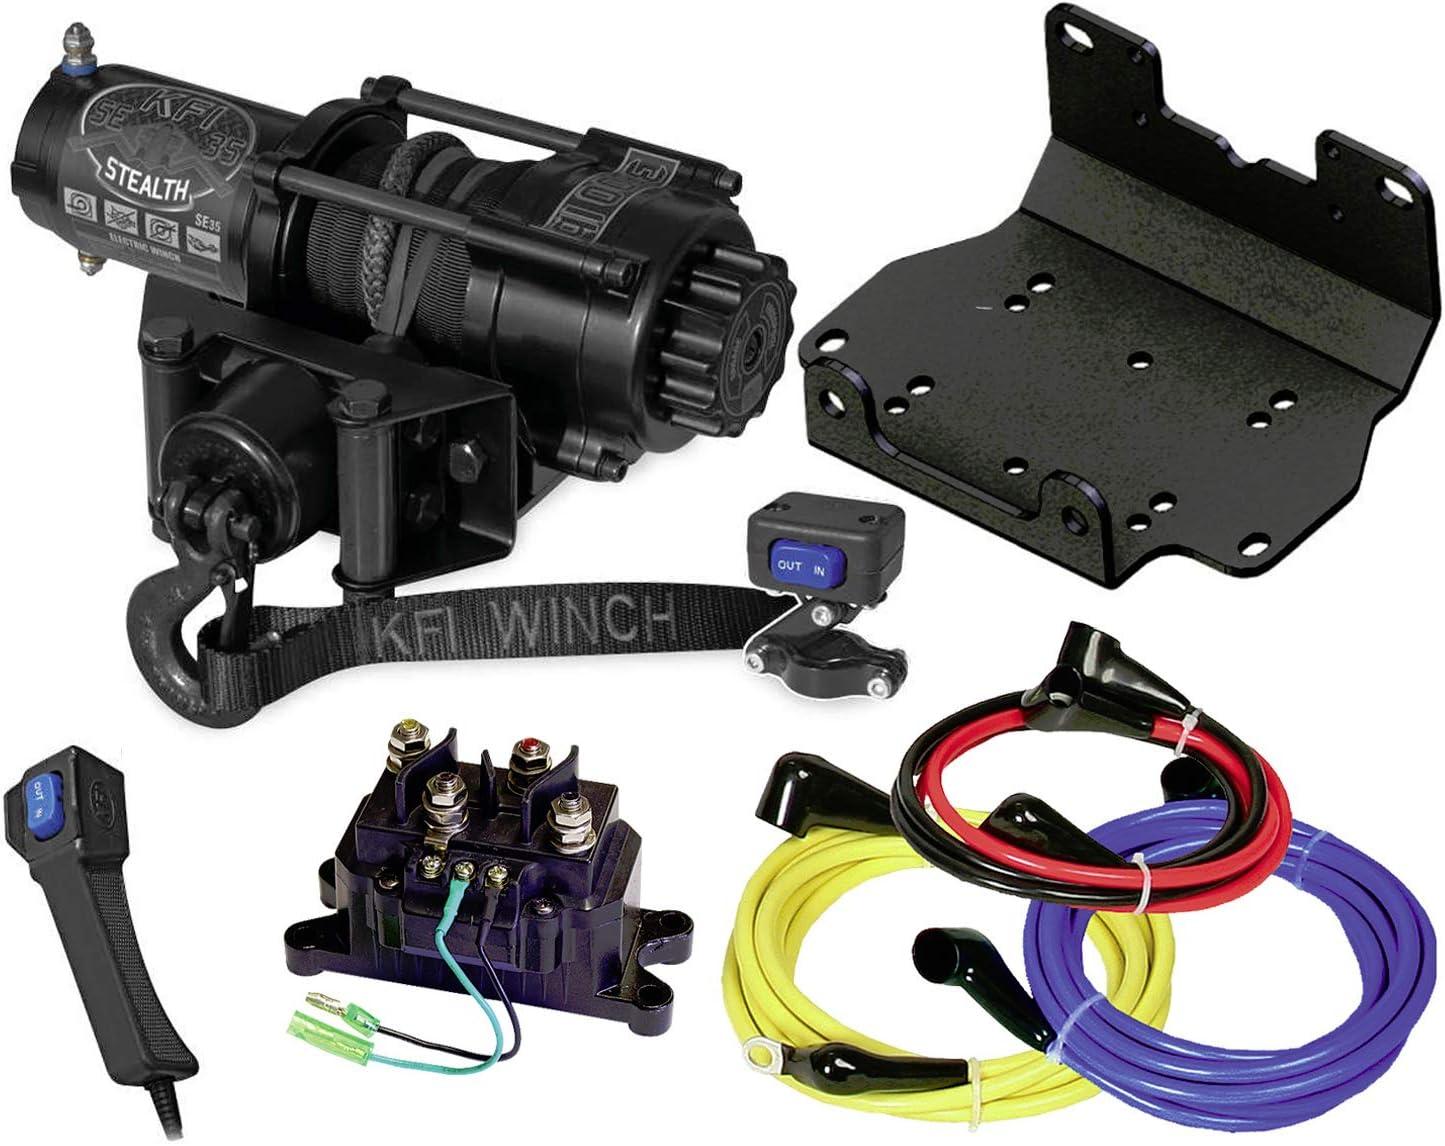 KFI 3000 LB Steel Cable Winch and Mount Kit Yamaha Grizzly Kodiak 700 2016-2020